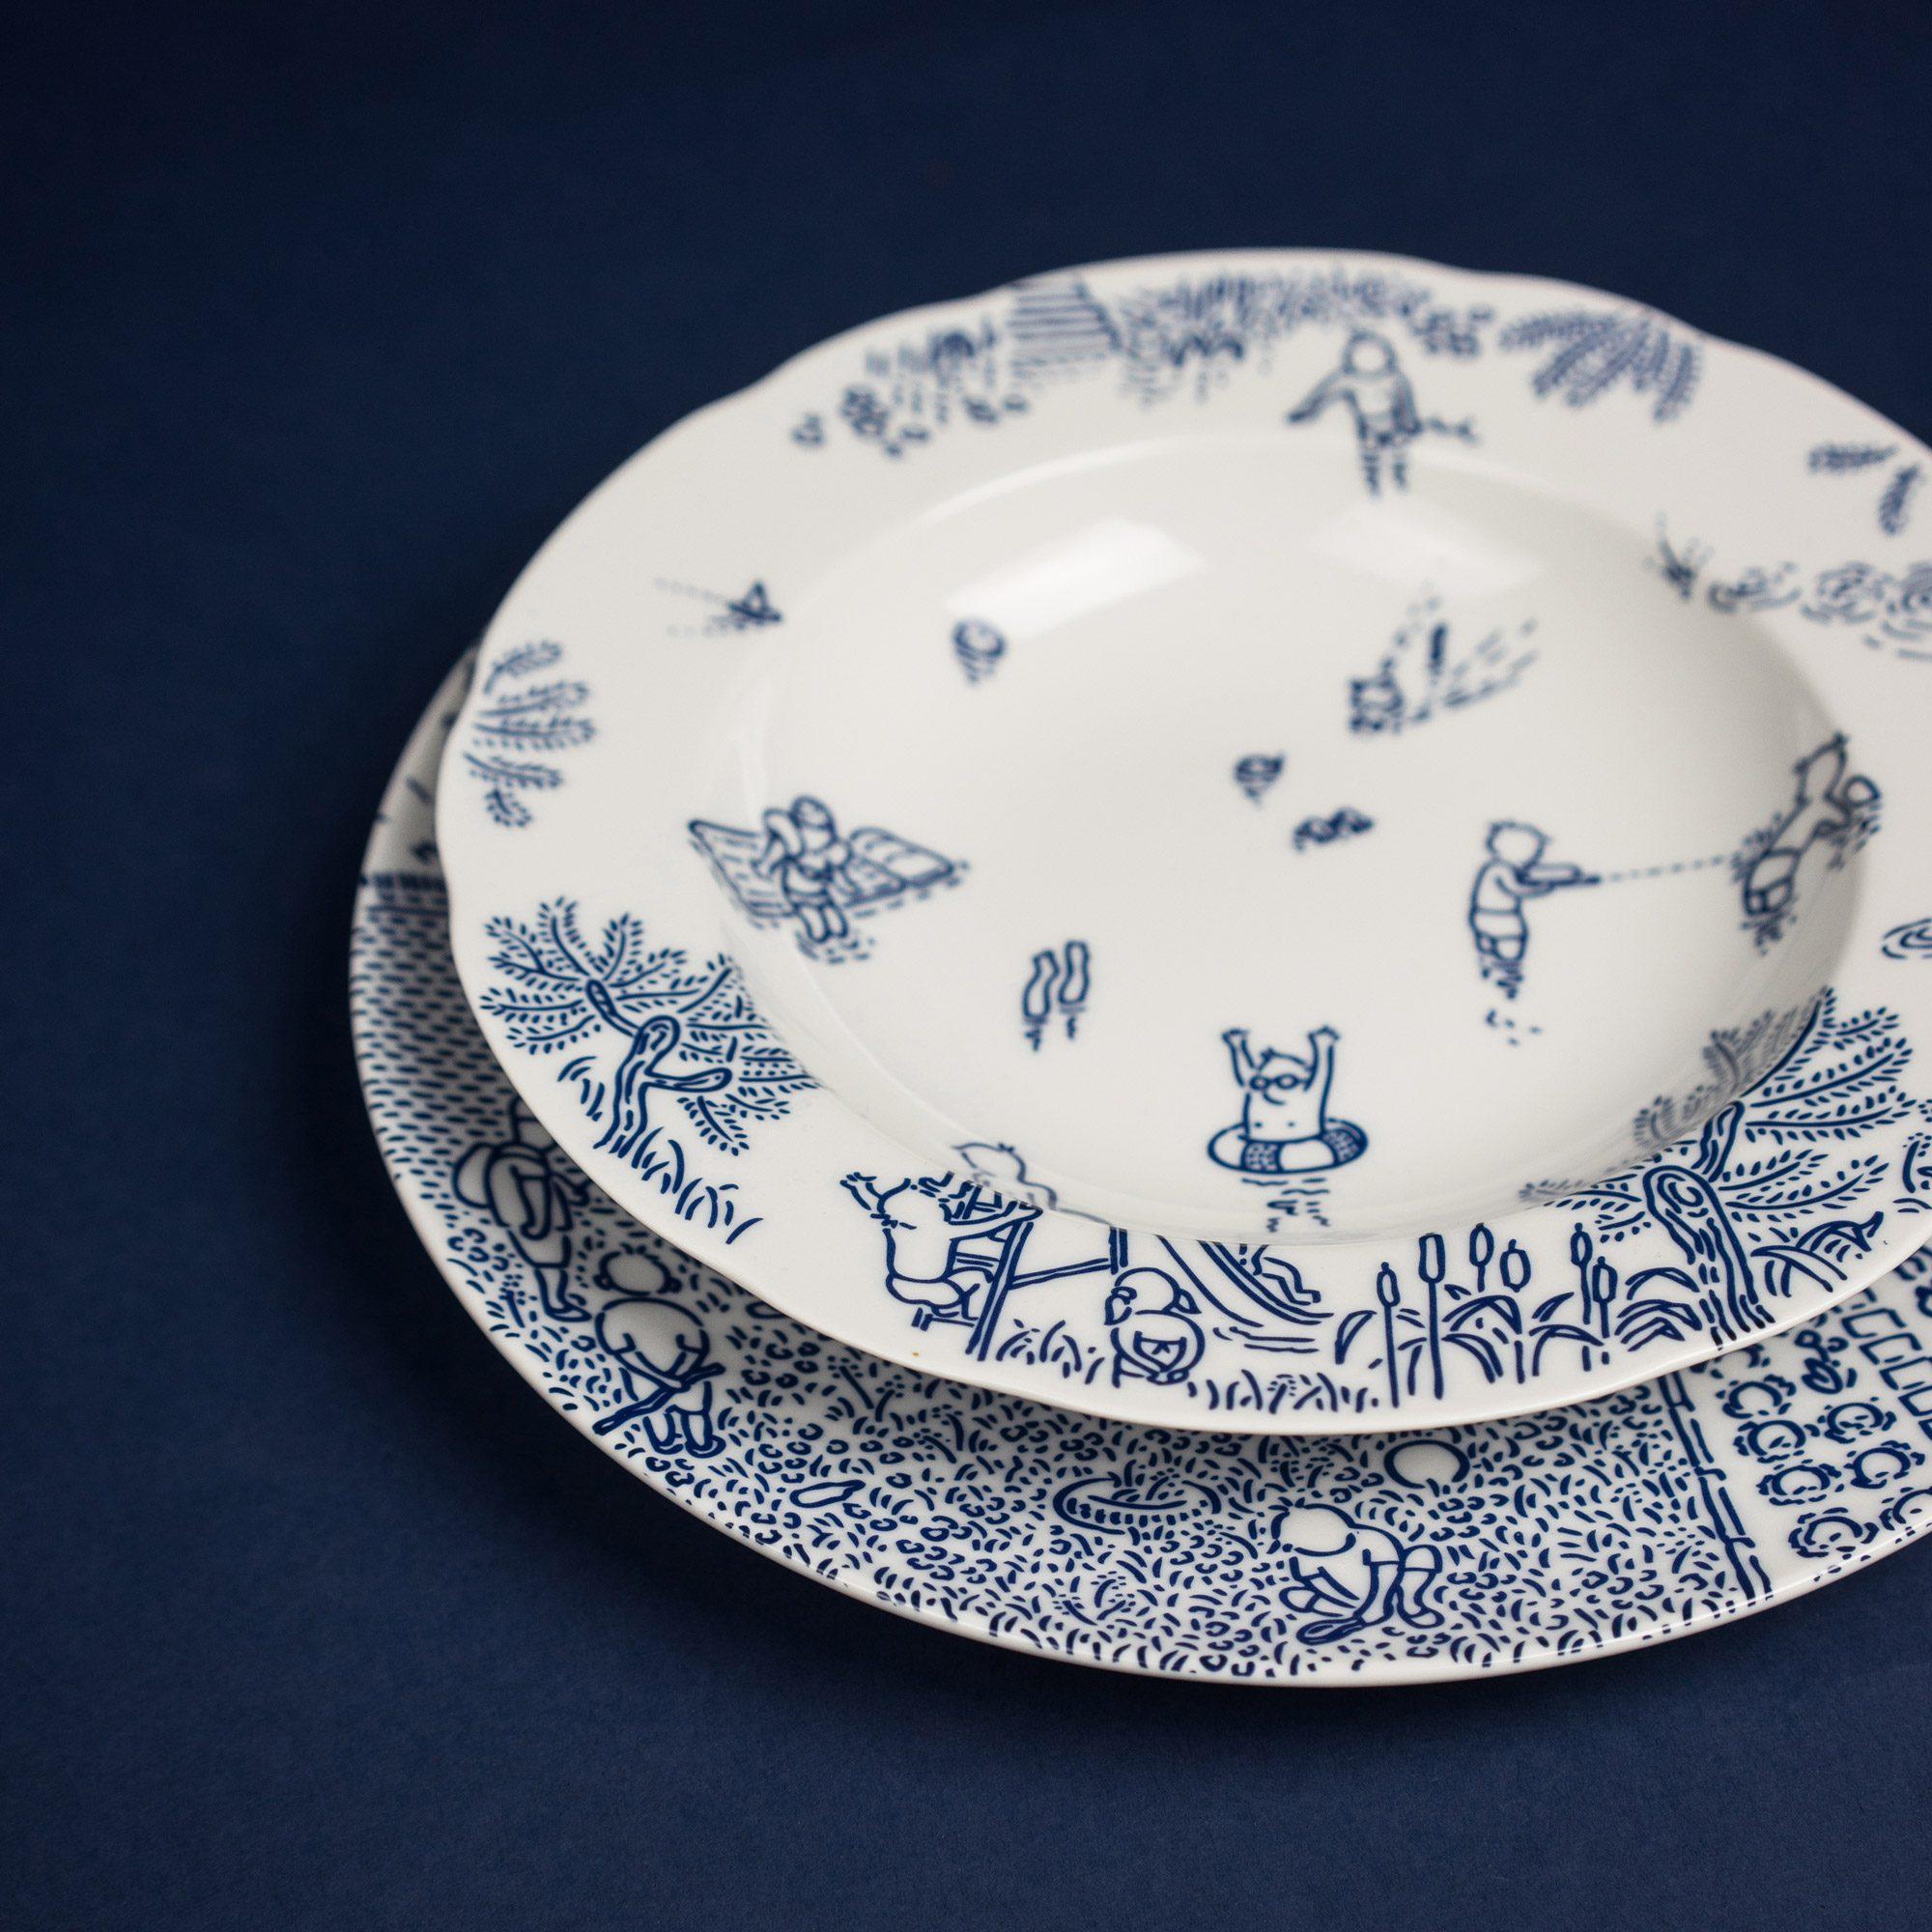 Blue porcelain soup and dinner plates by Michal Bacak for Krehky design studio